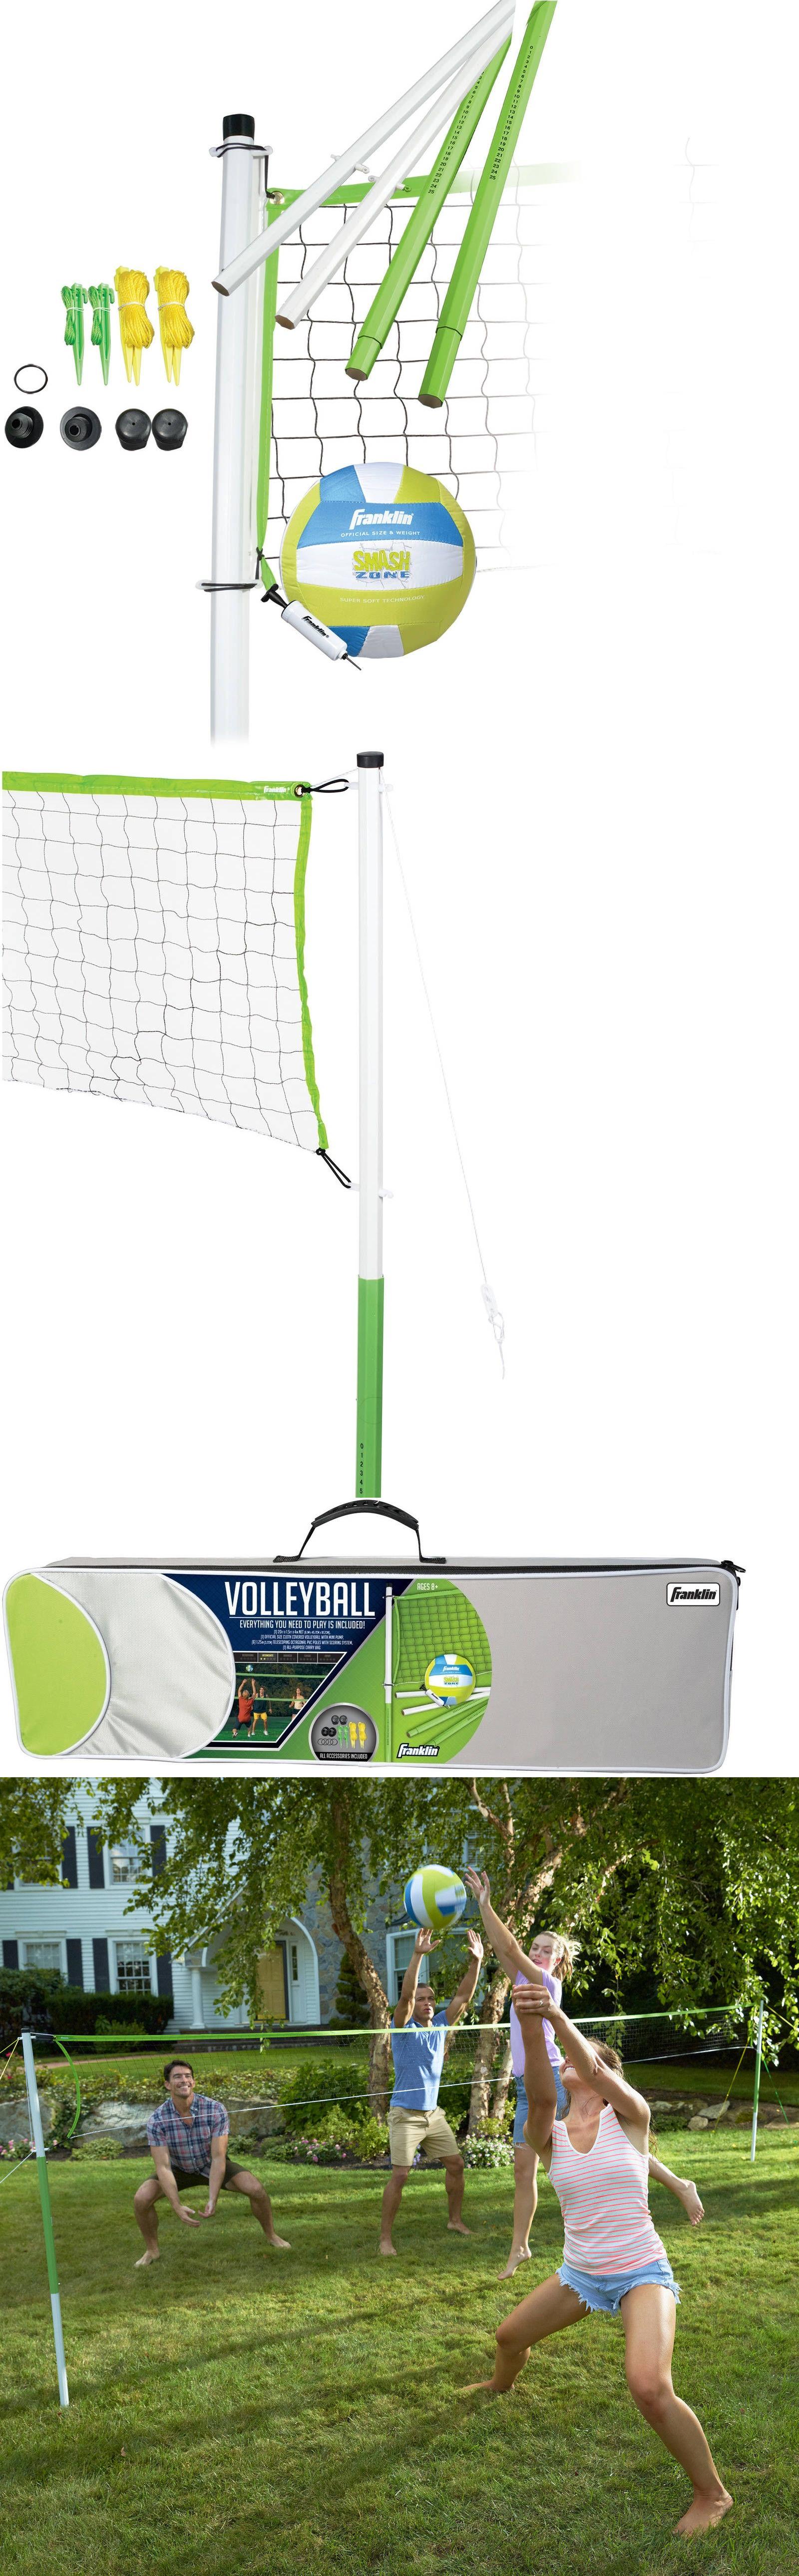 nets 159131 franklin team sports outdoor volleyball set beach